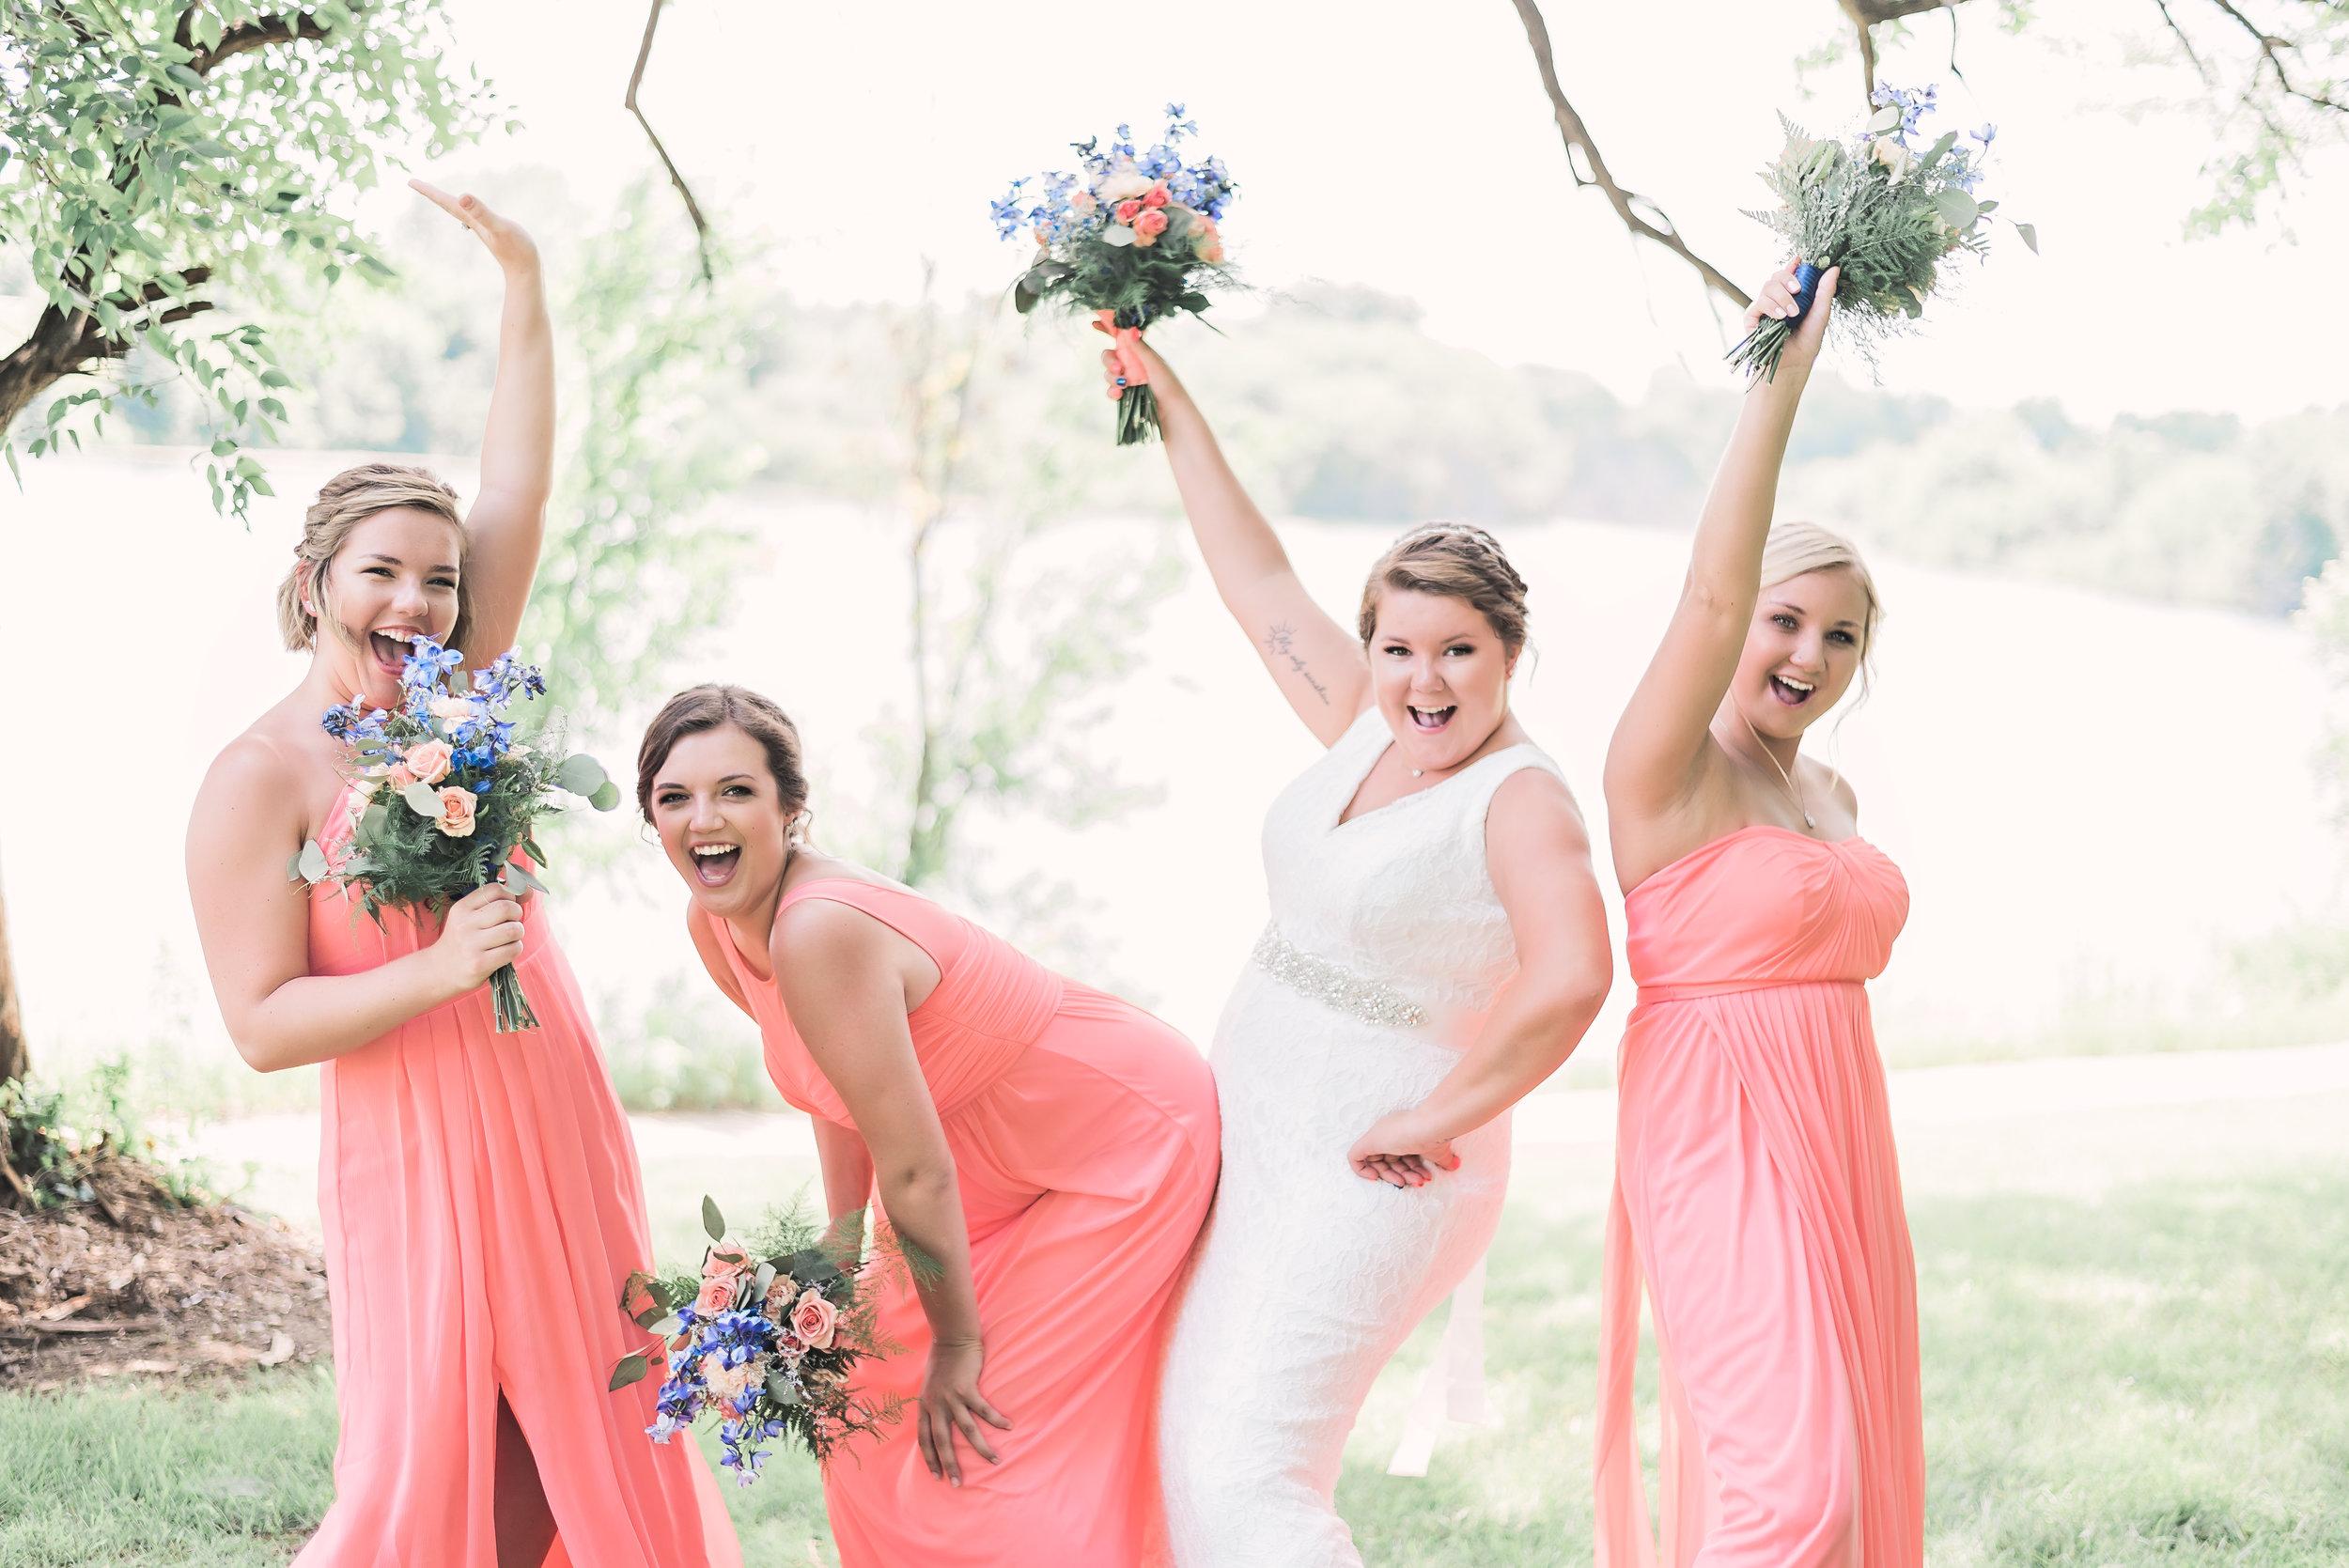 bridesmaids silly pose